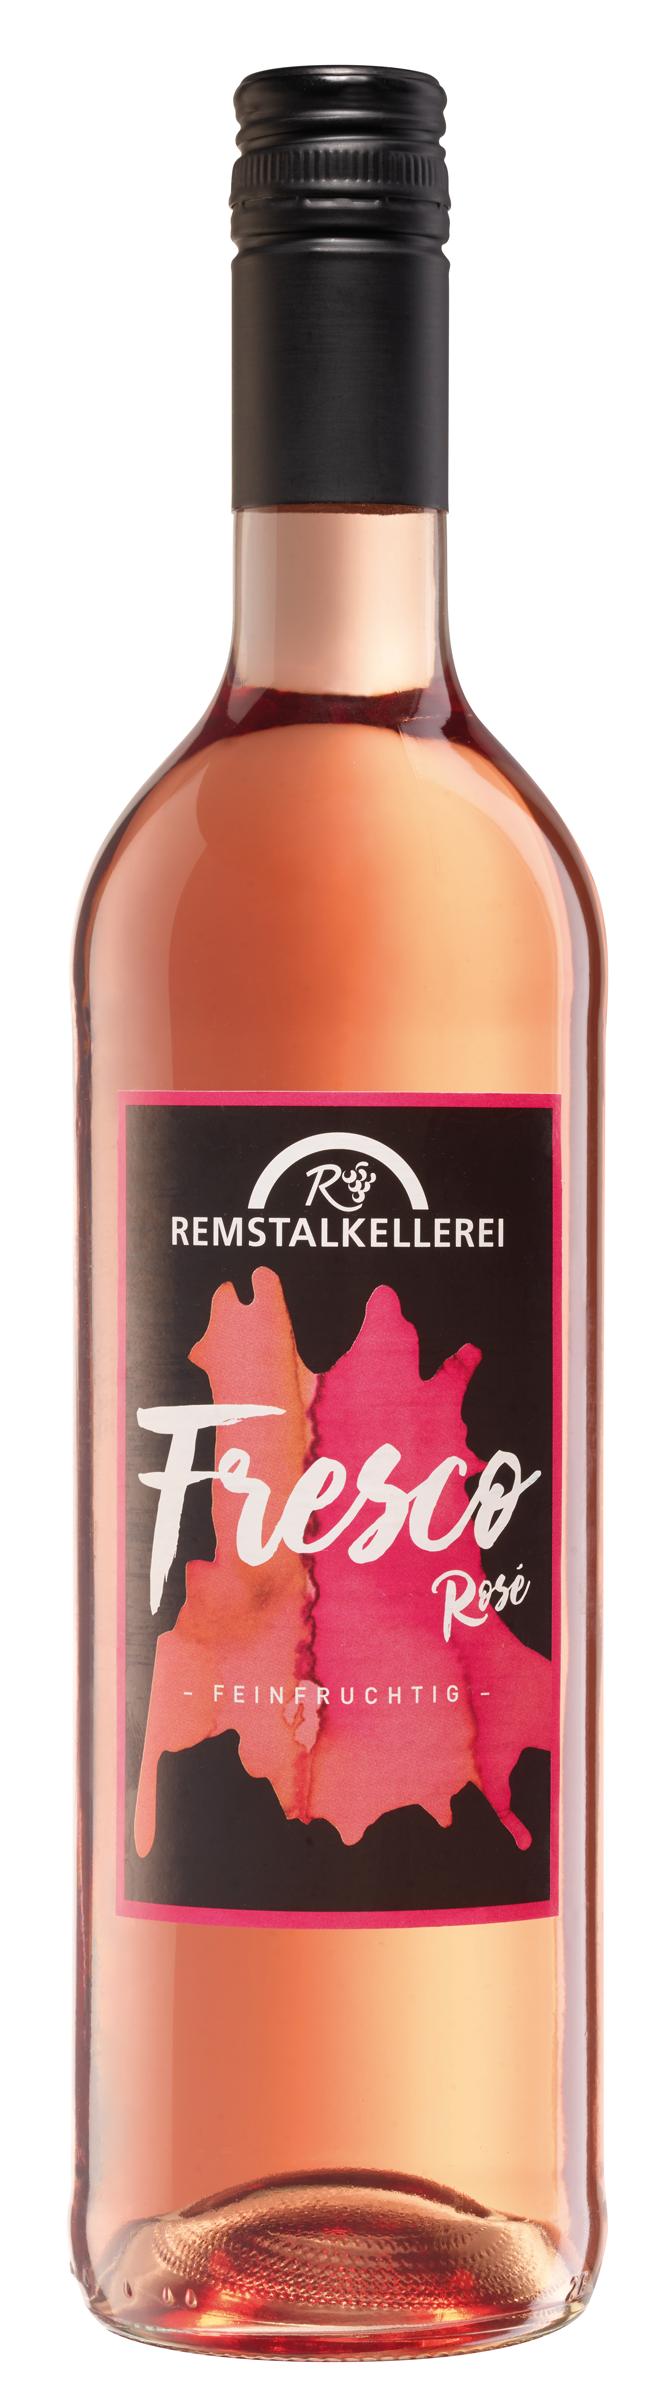 Fresco Rosé feinfruchtig